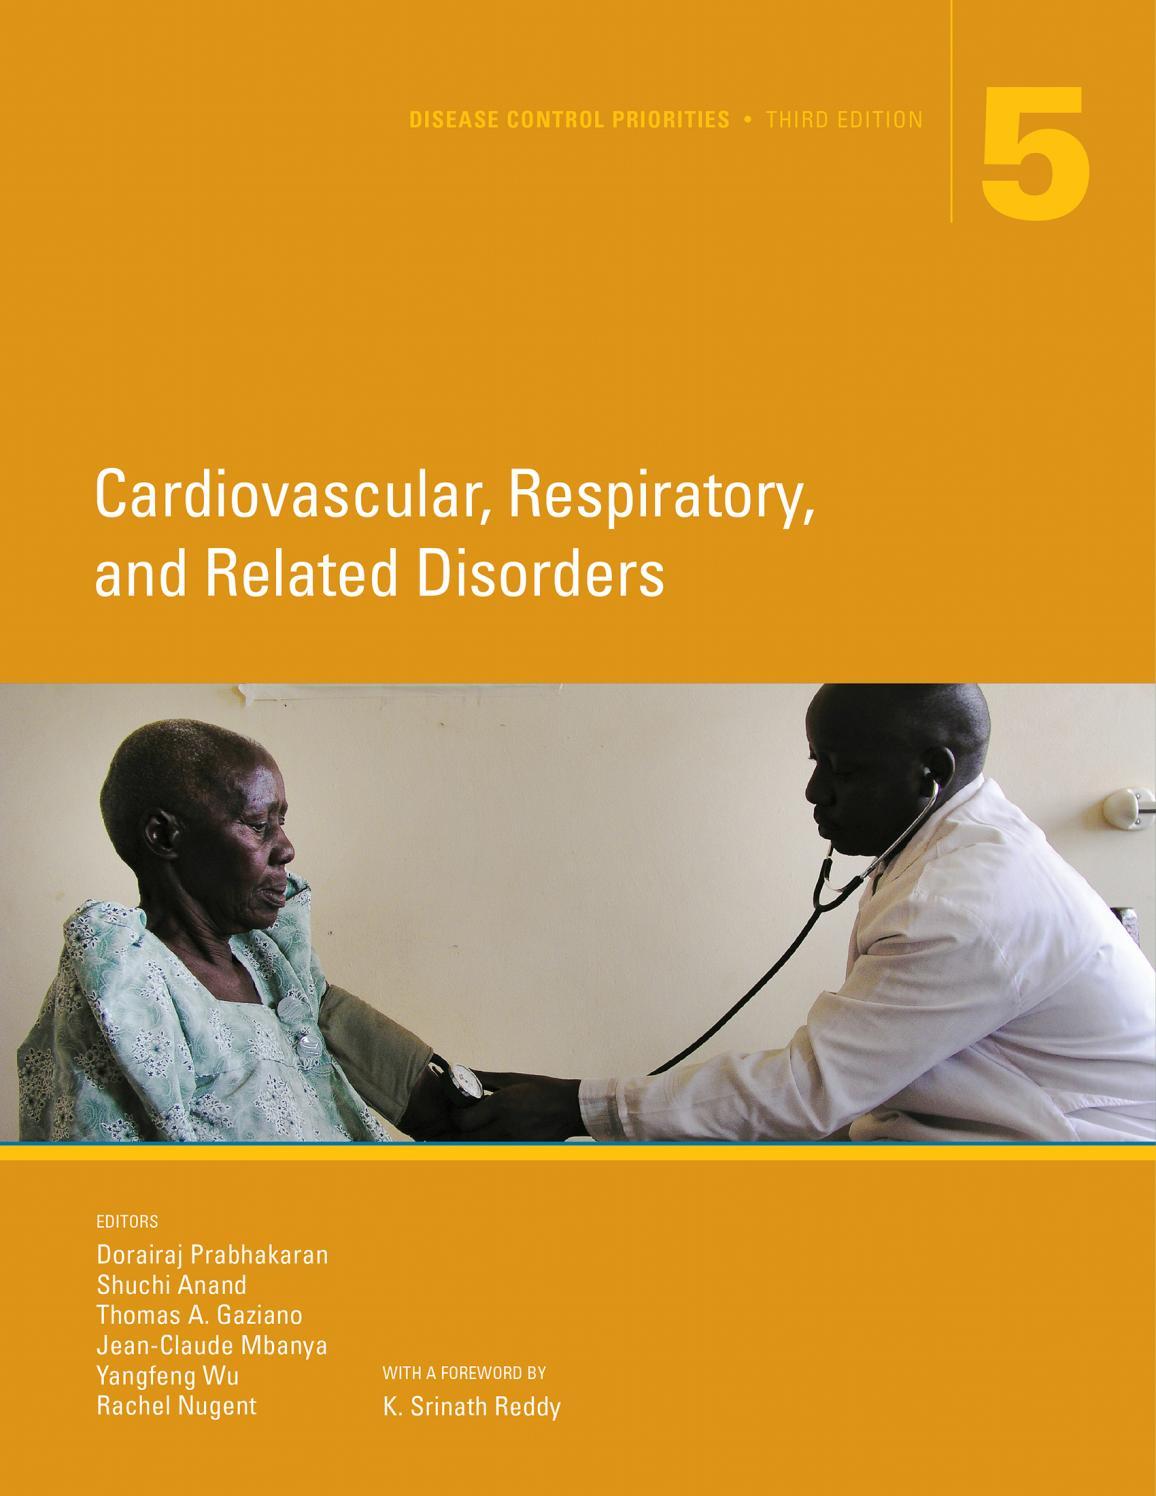 Disease Control Priorities, Third Edition (Volume 5) by